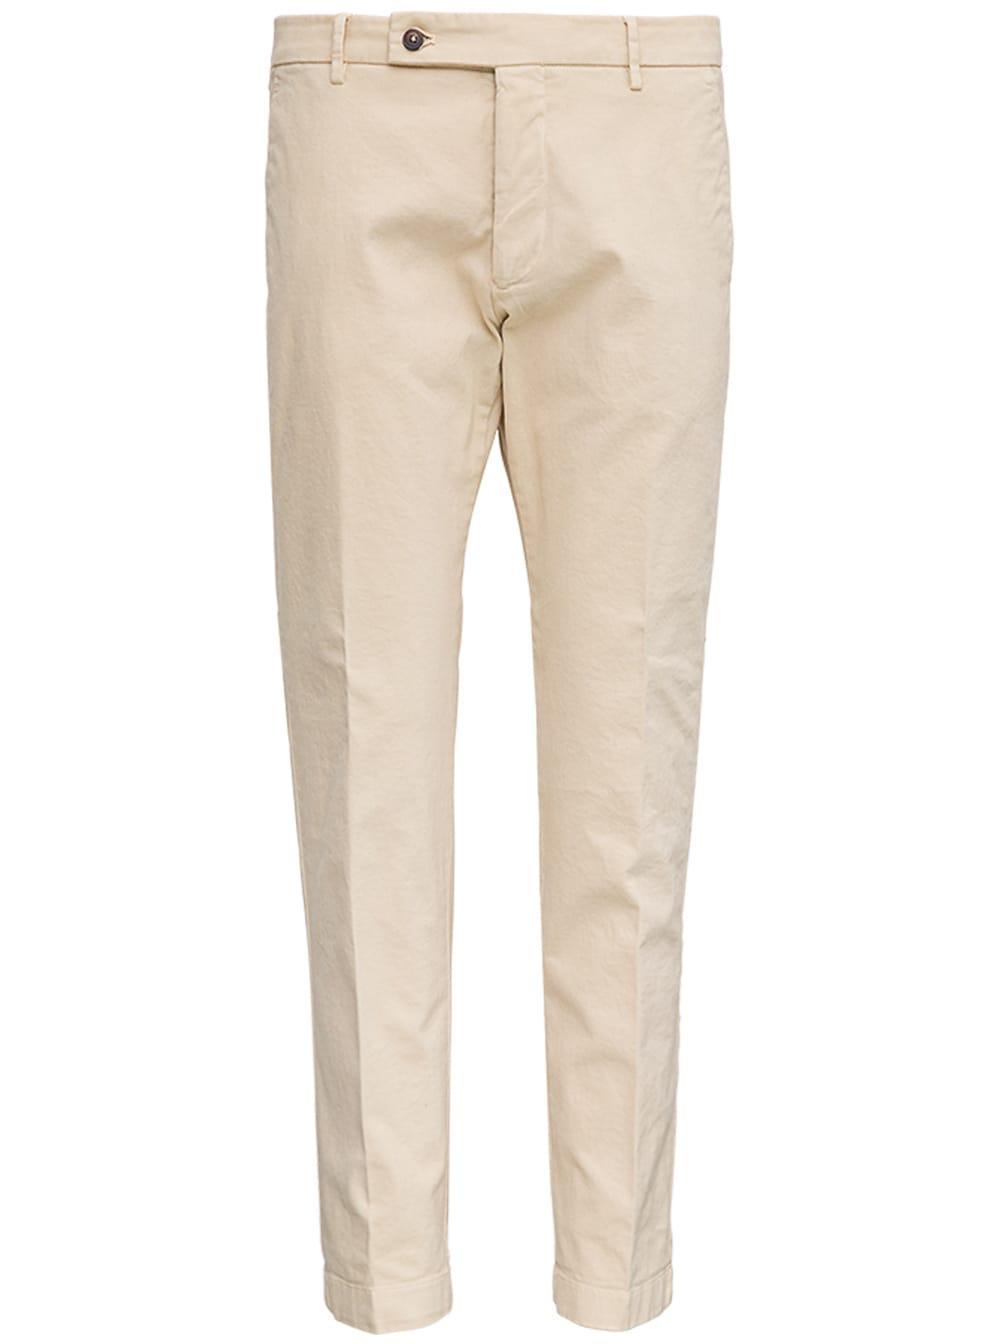 Beige Cotton Tailored Pants